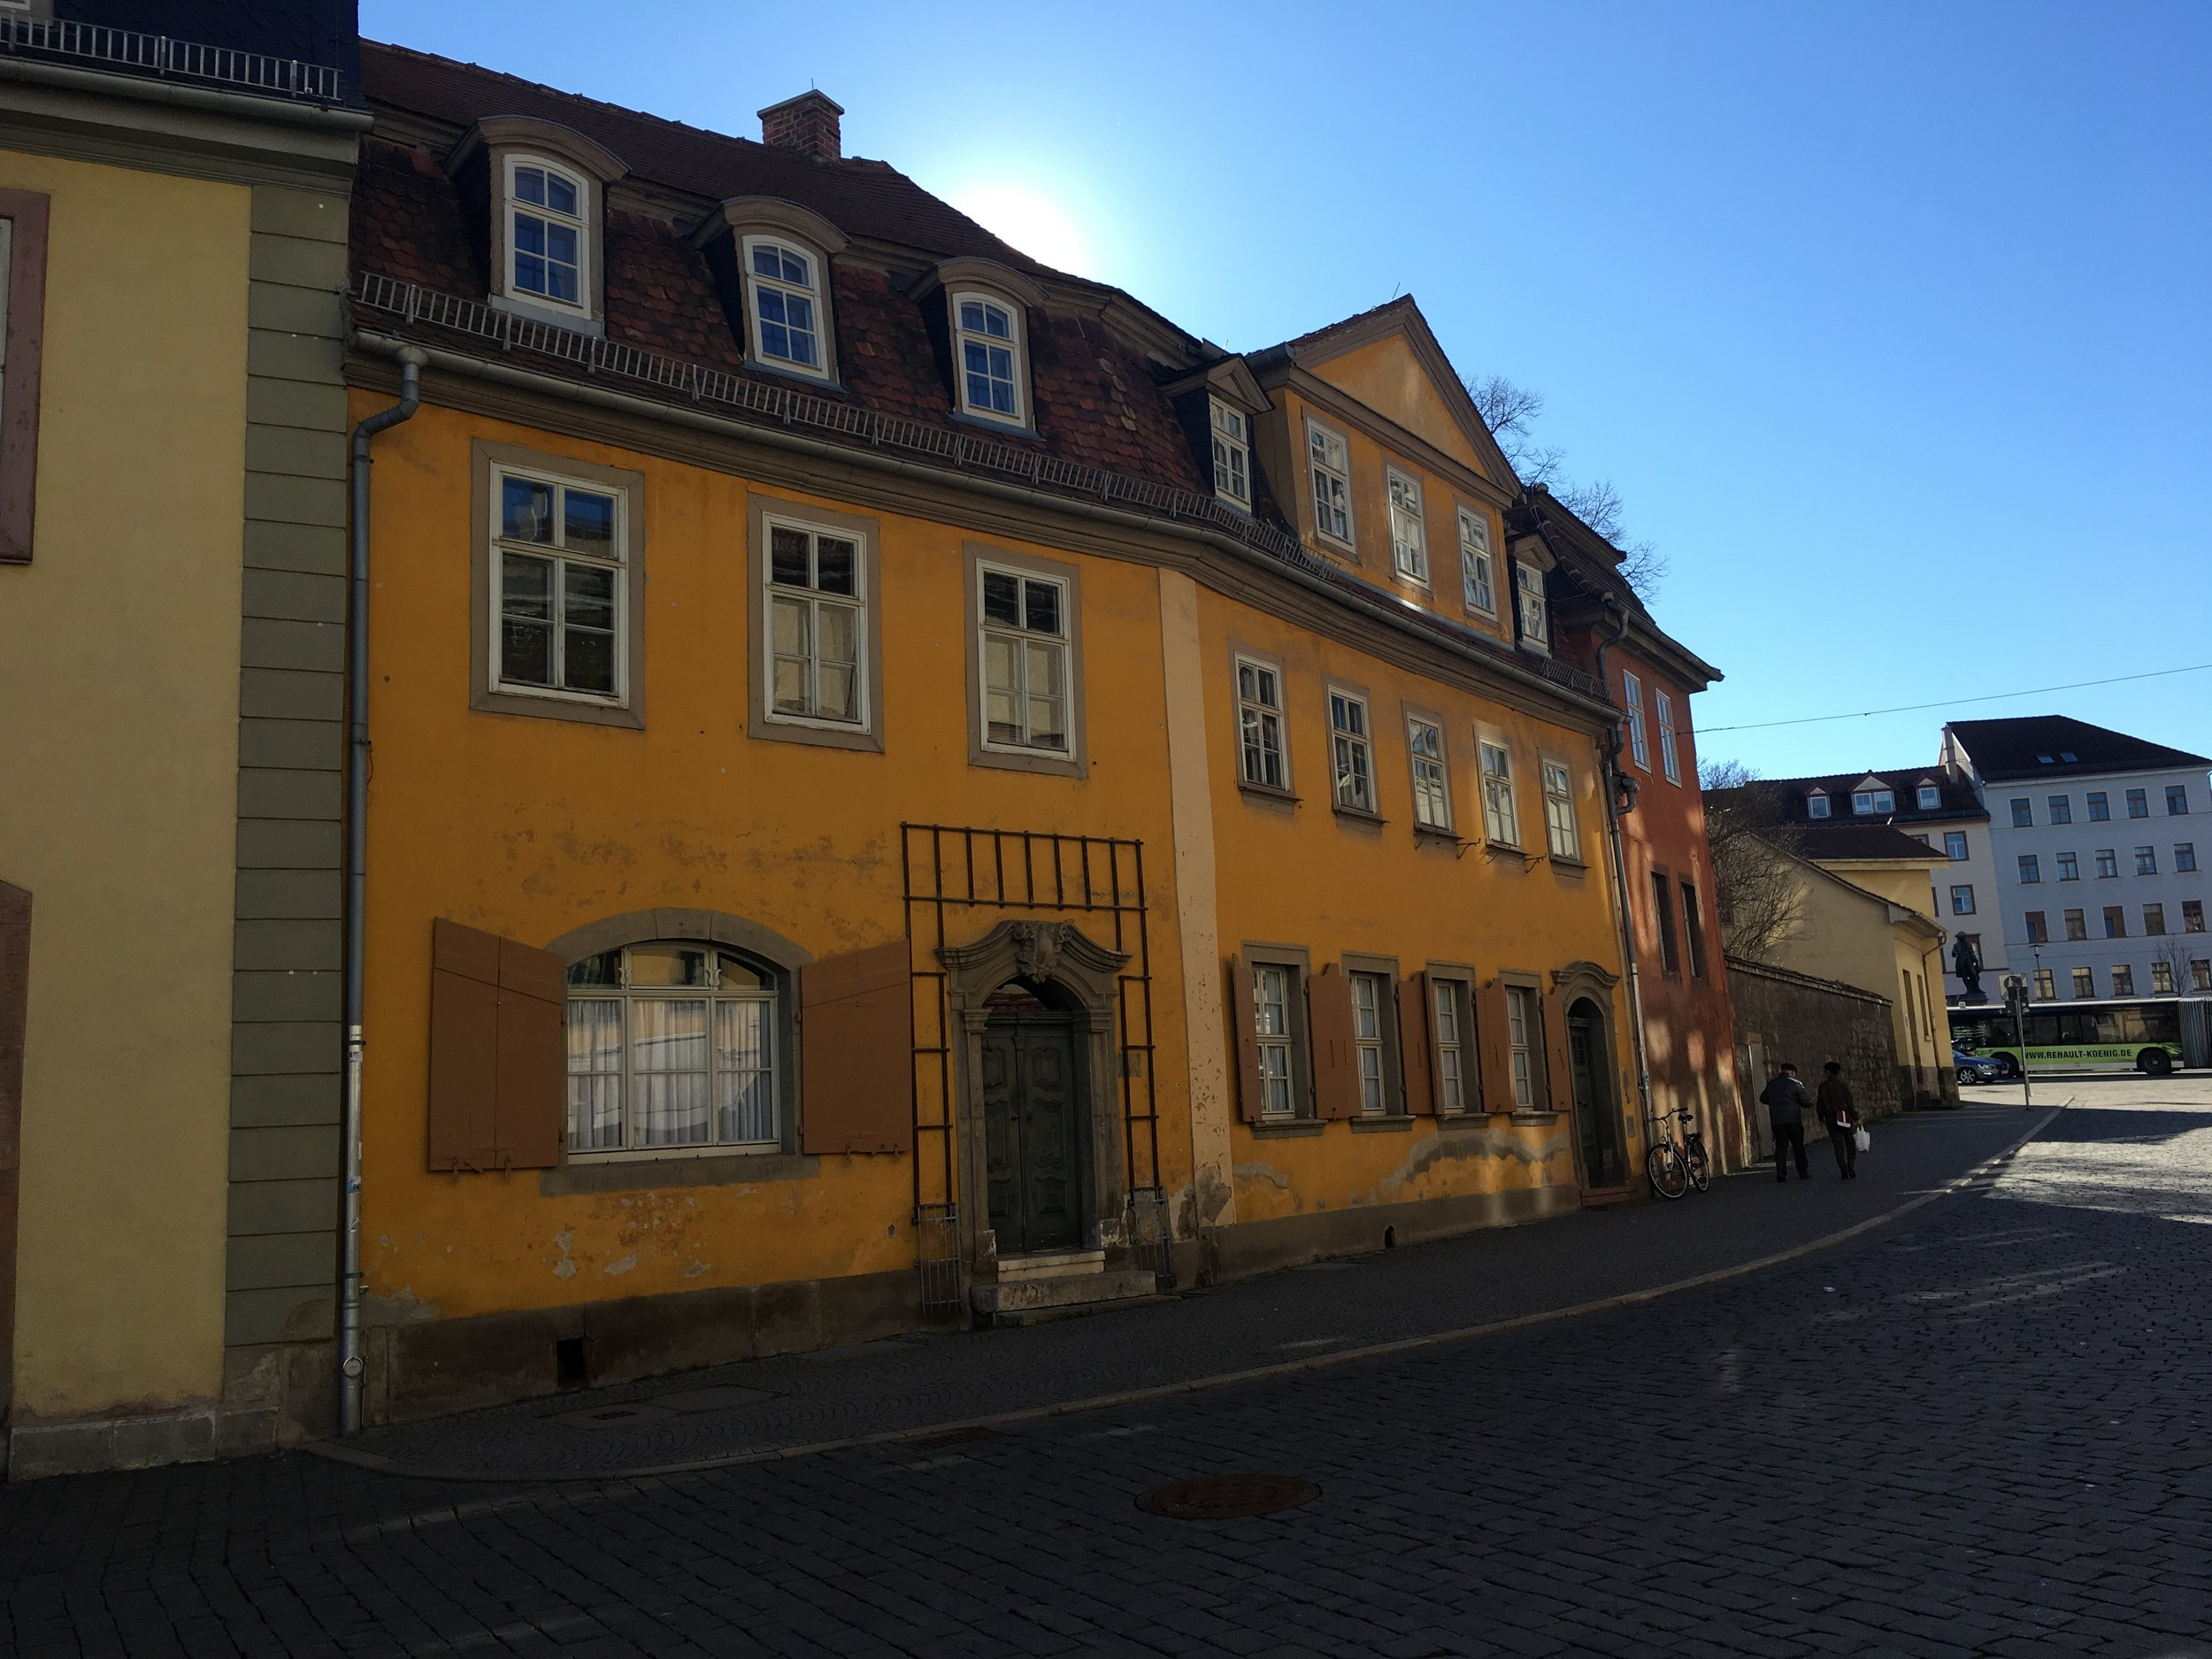 Outside of Goethe Haus in Weimar